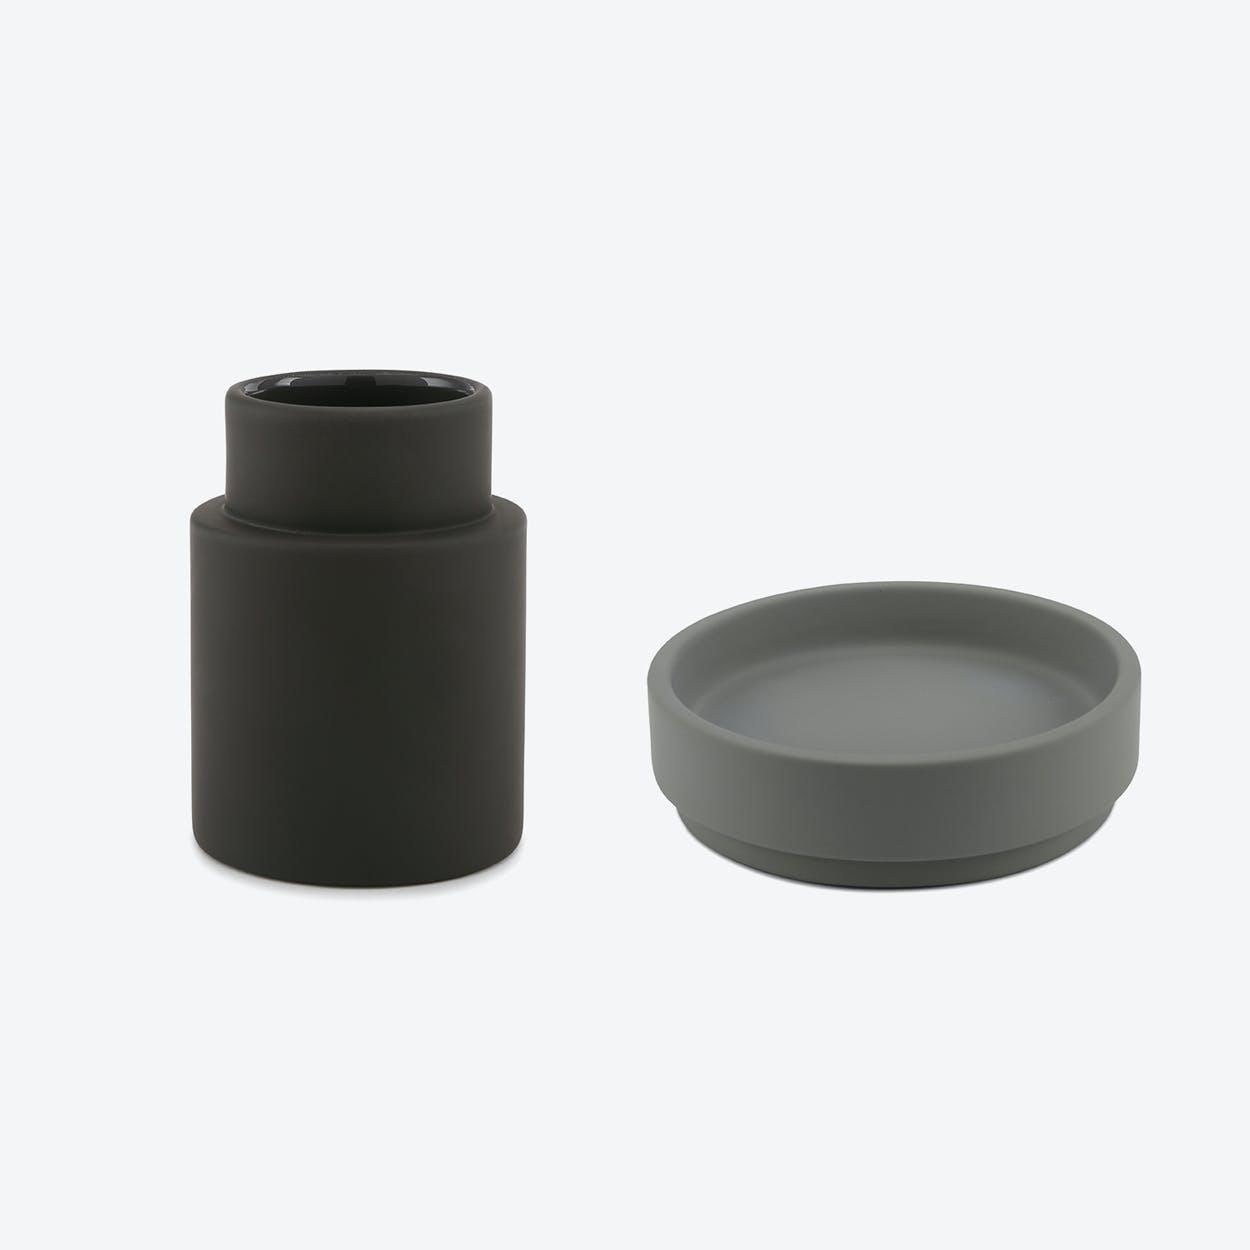 Shades Counter Set, Model B in Grey